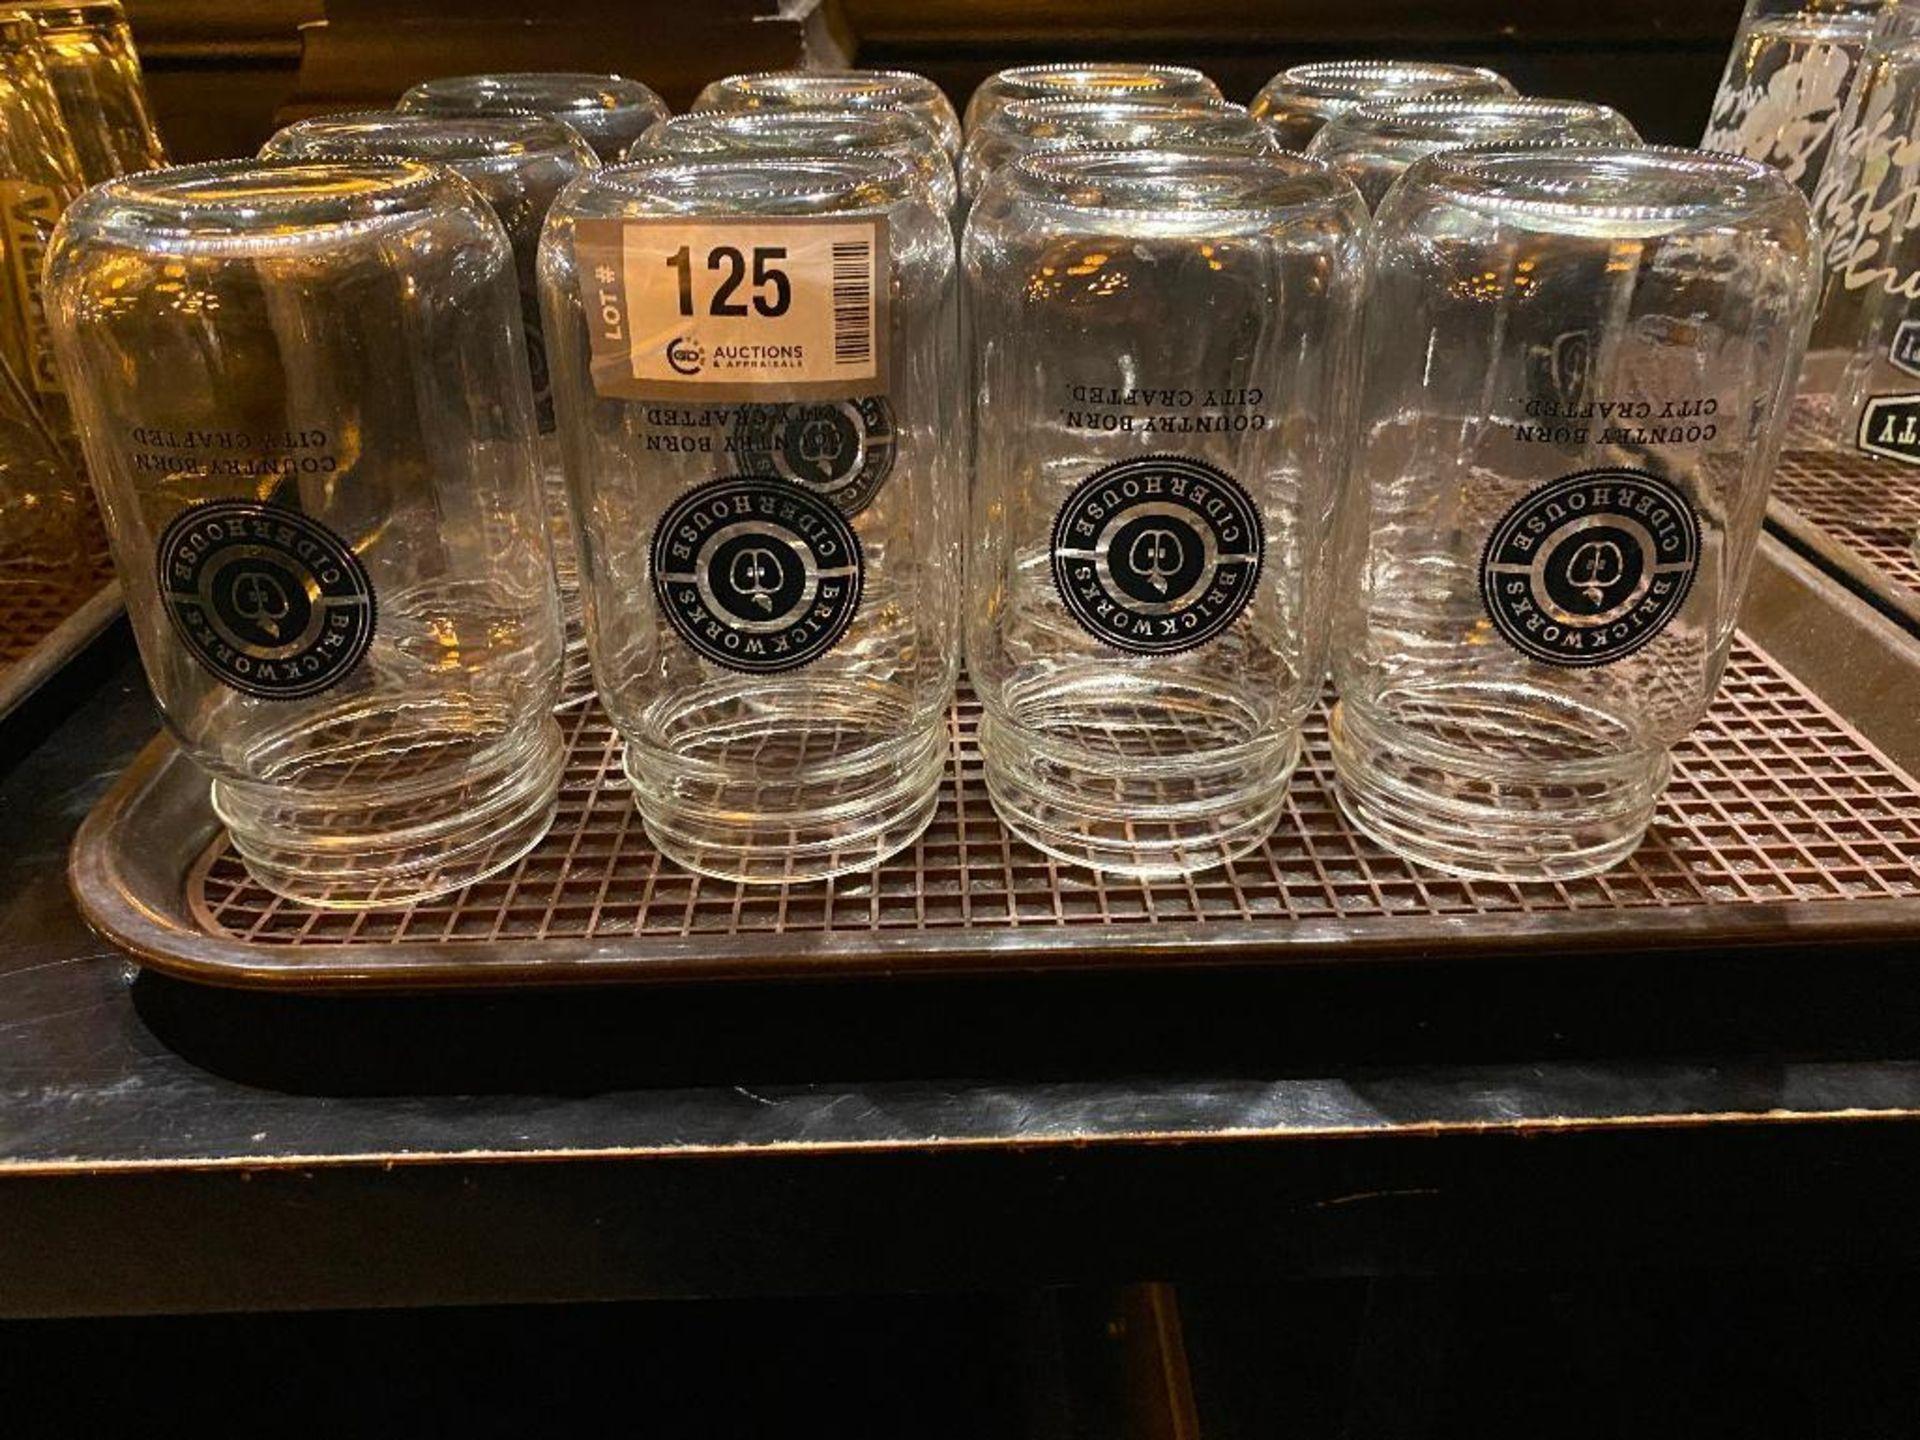 LOT OF (12) BRICKWORKS CIDERHOUSE MASON JAR GLASSES - Image 2 of 2